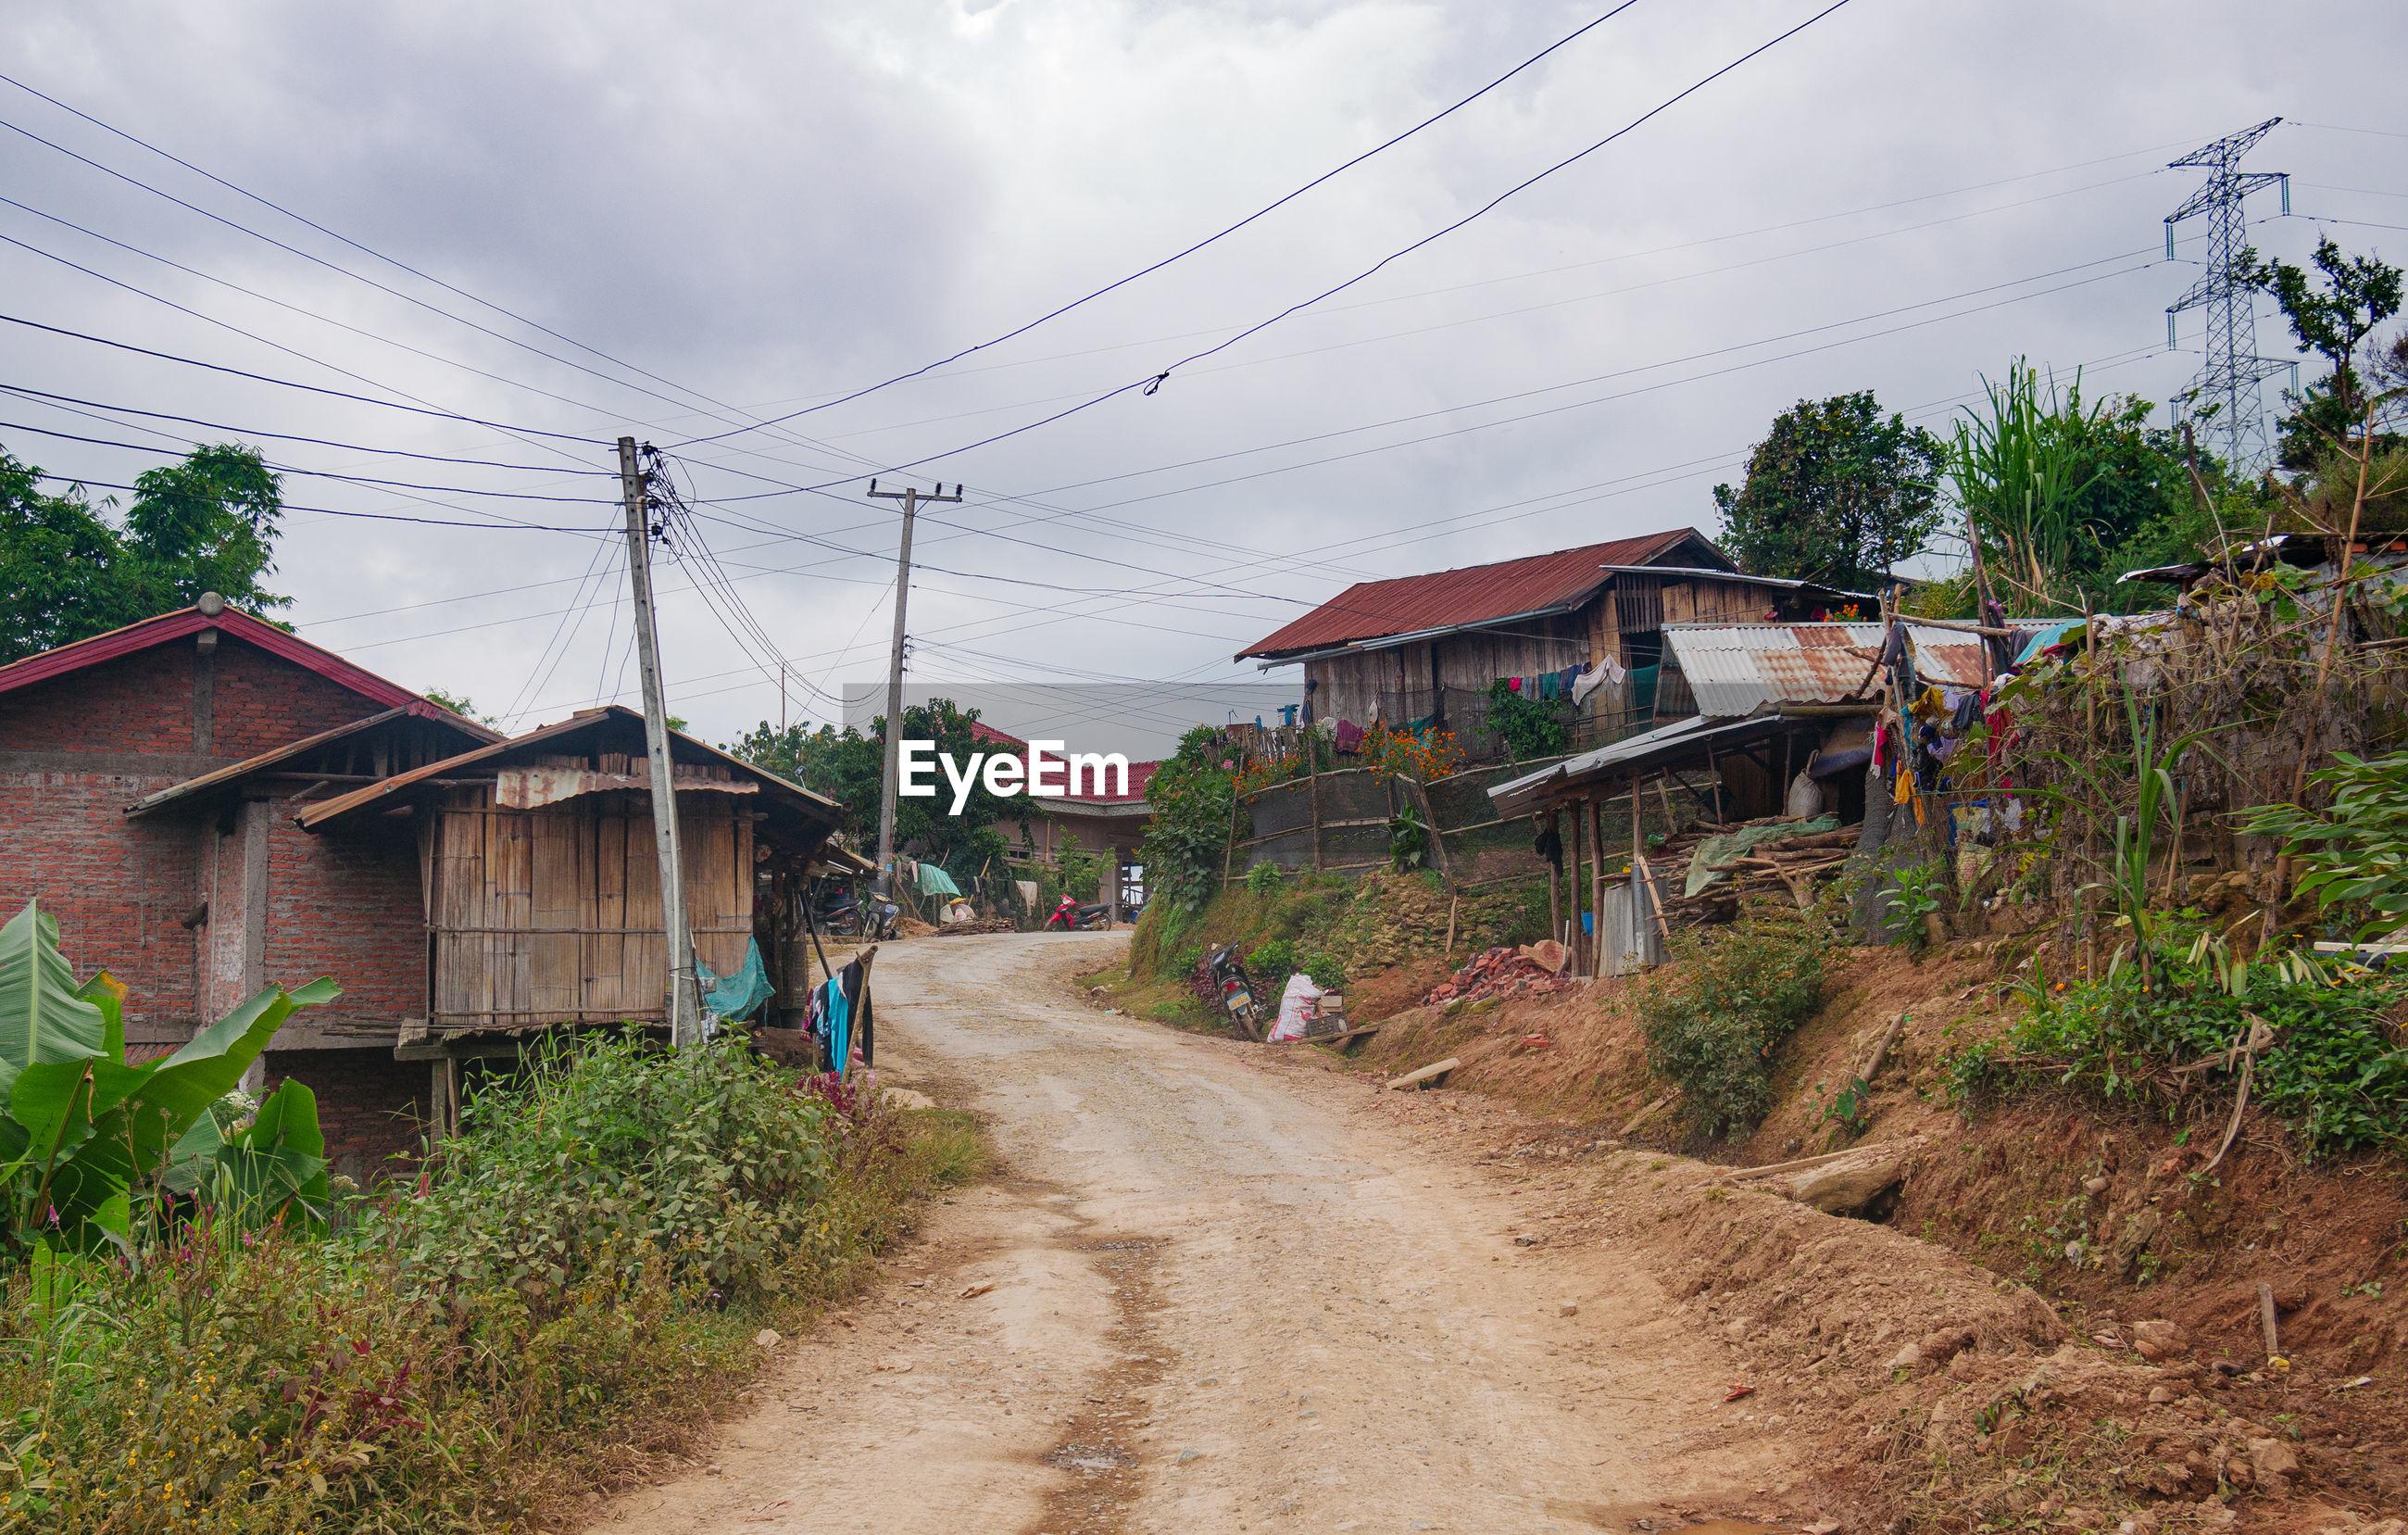 HOUSES BY DIRT ROAD AGAINST SKY